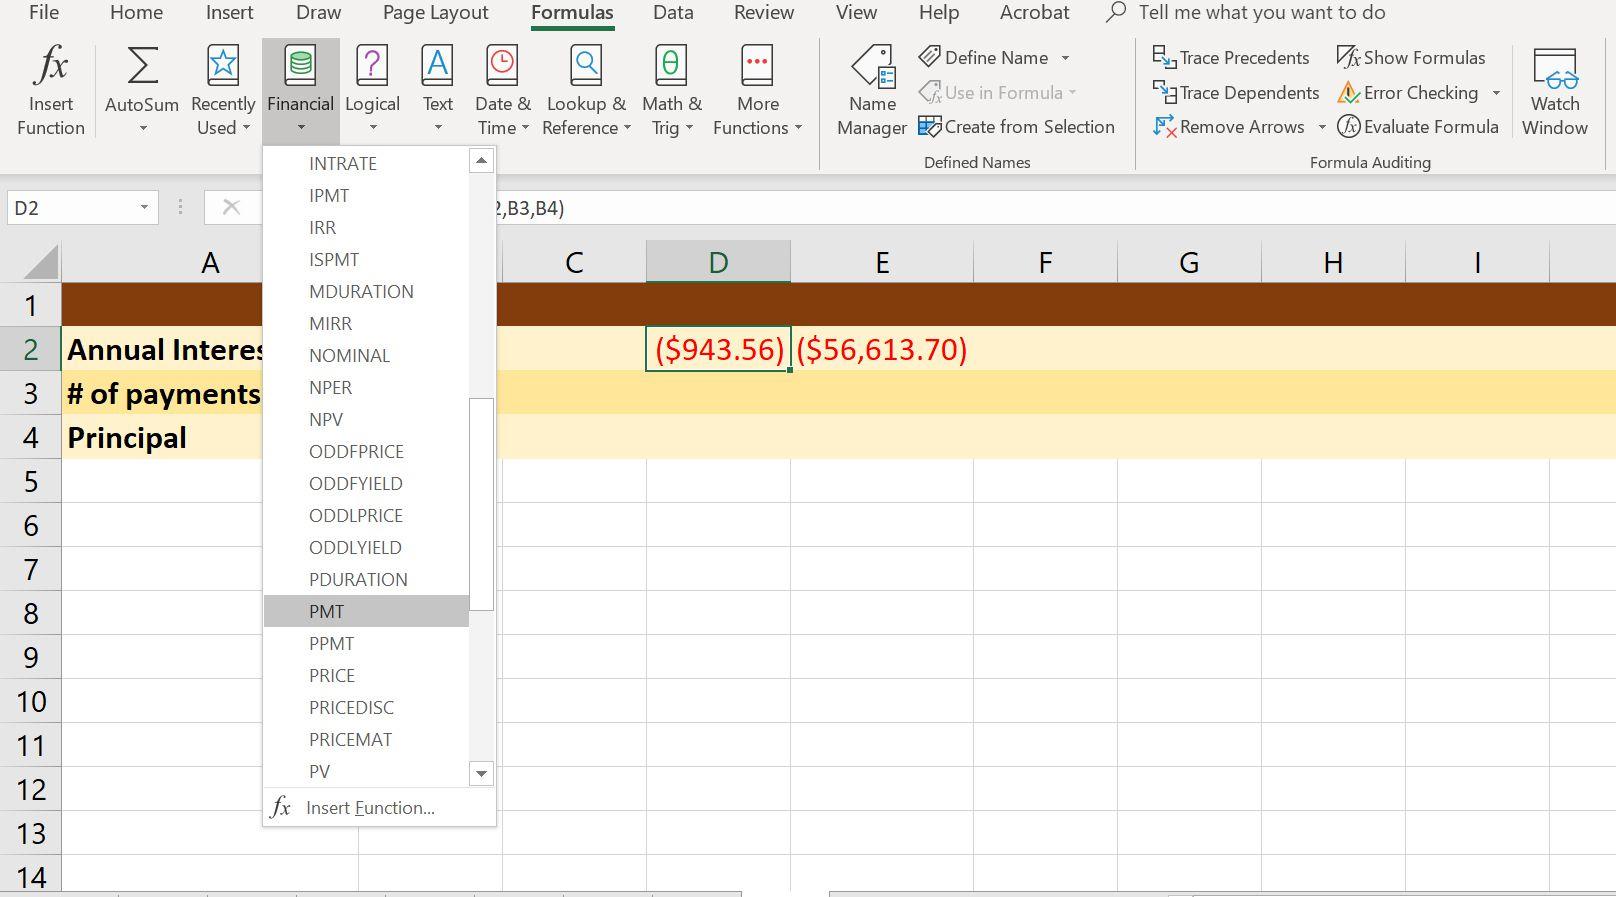 A screenshot of Excel's Financial formula drop-down menu with PMT selected.